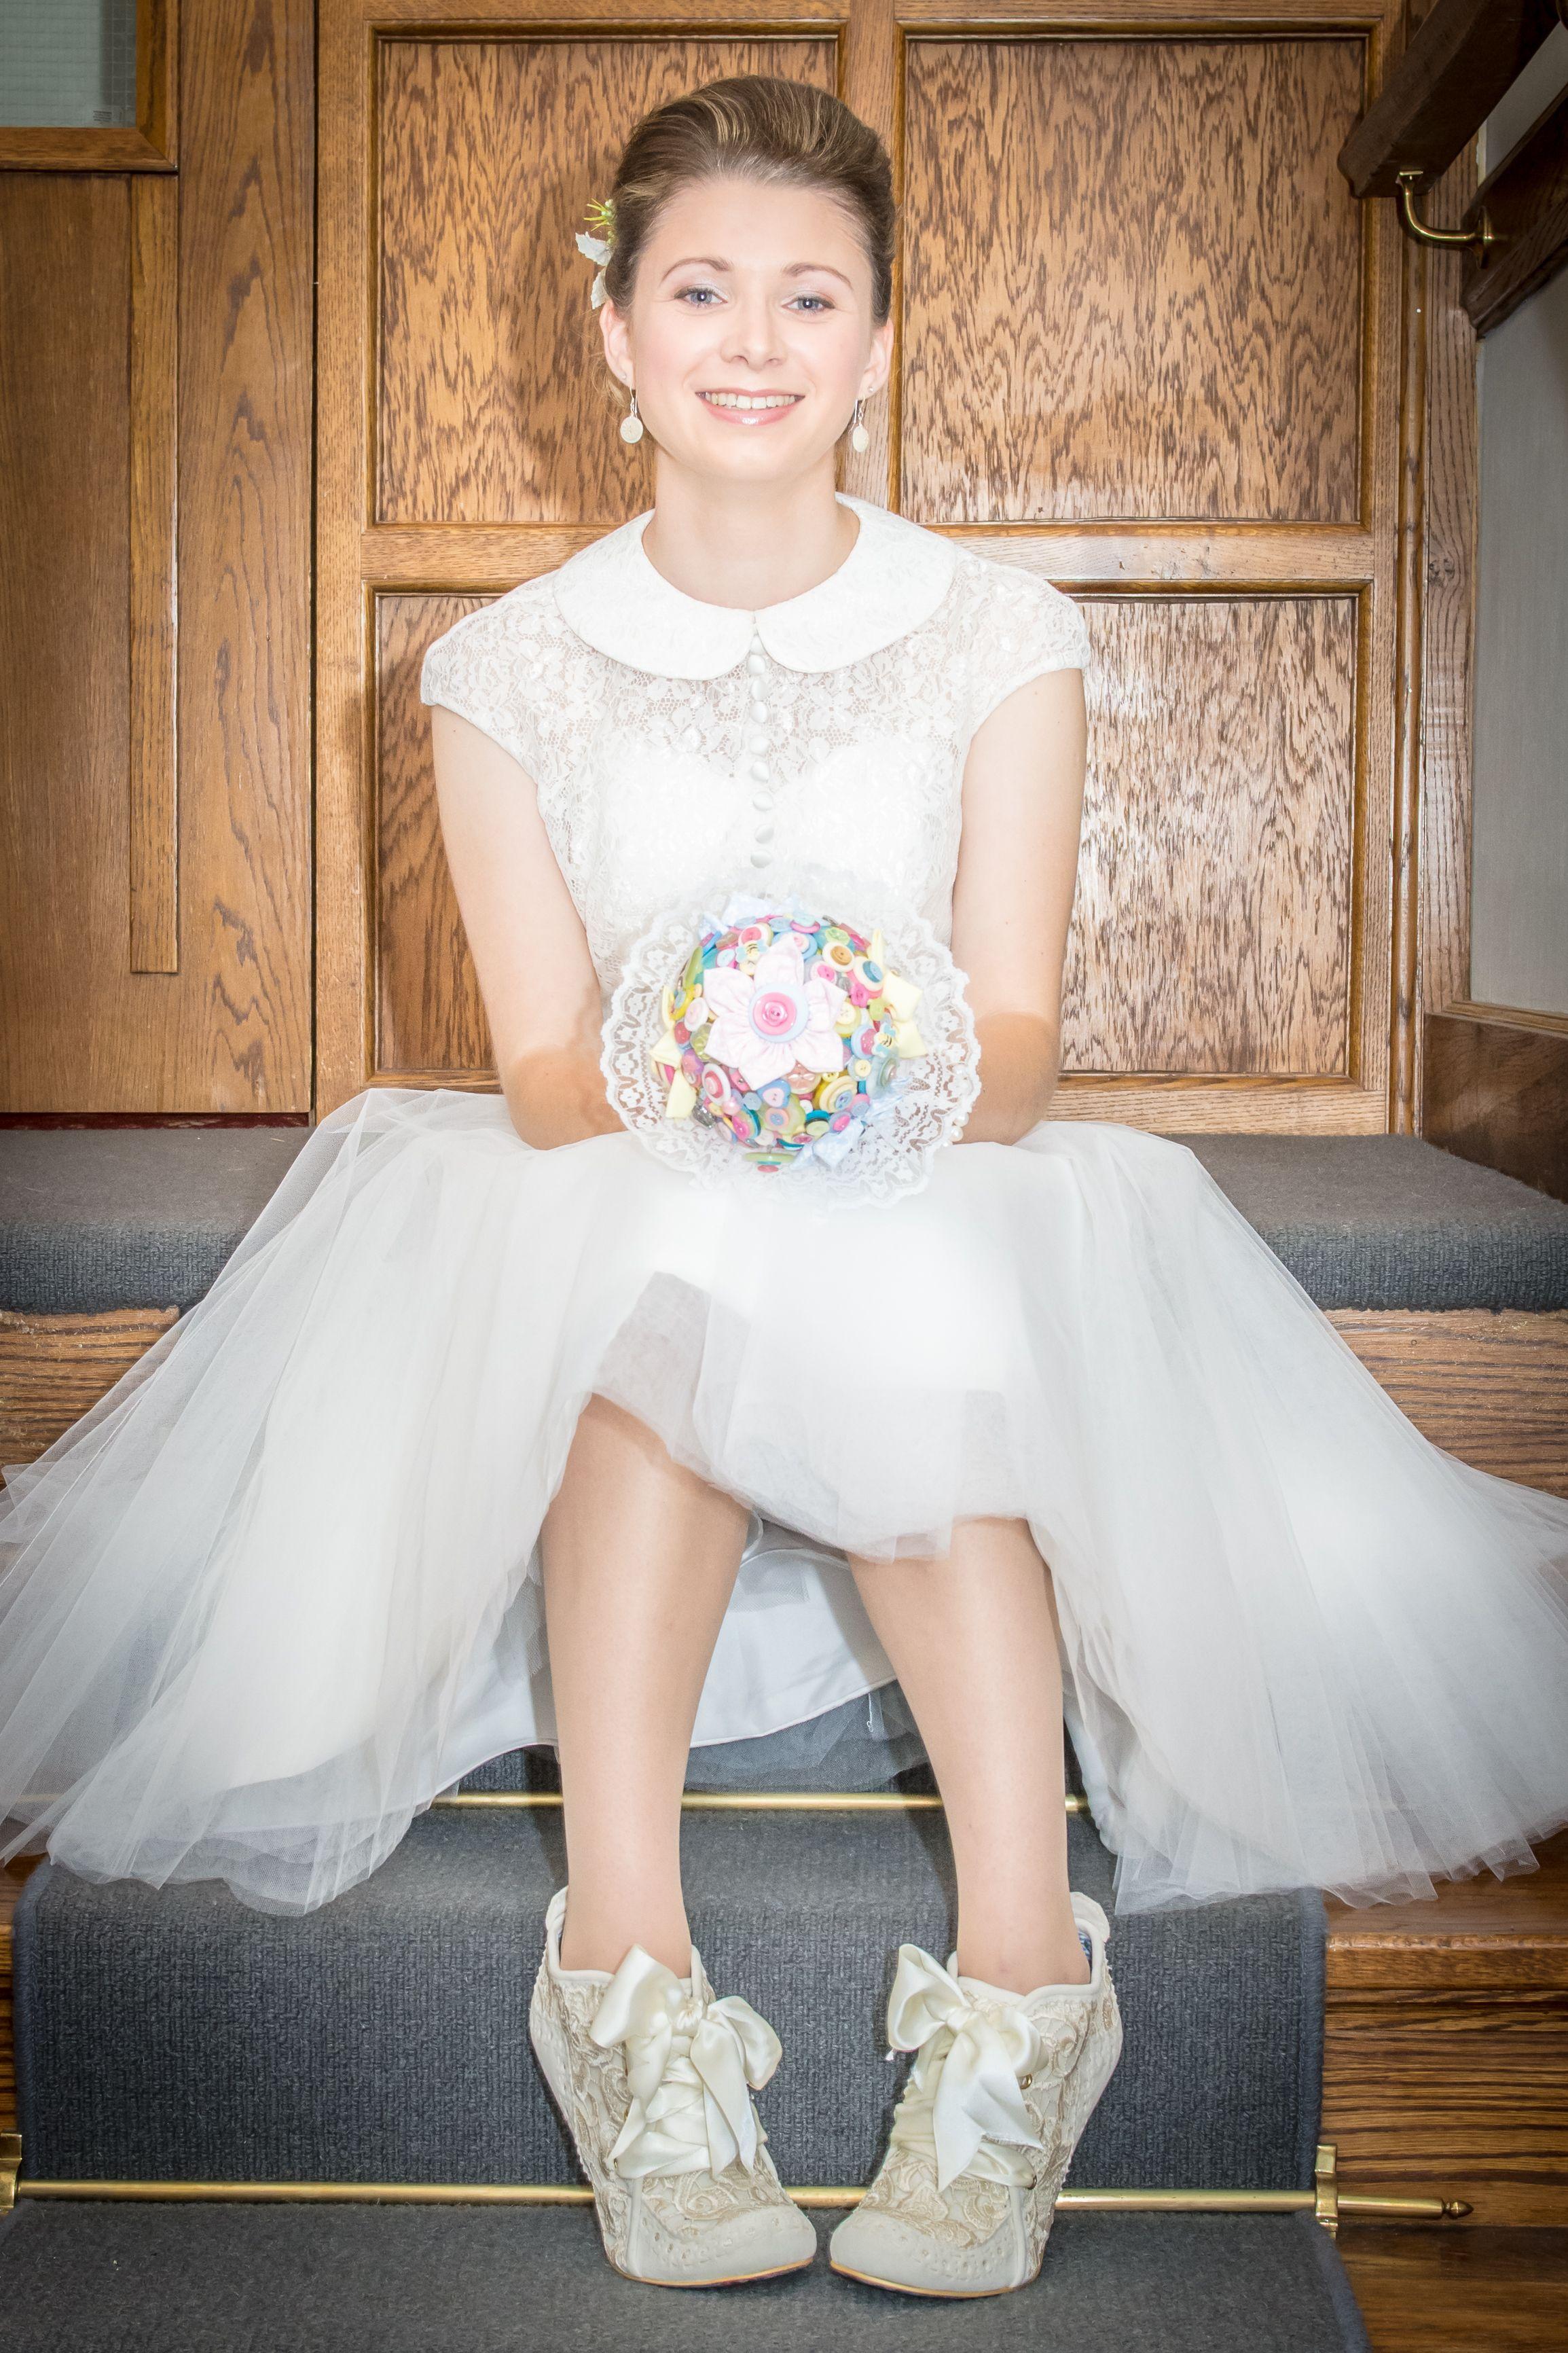 Preloved pronovias wedding dresses  Gorgeous Kitty u Dulcie bride Aimie wearing our uCrazy For You